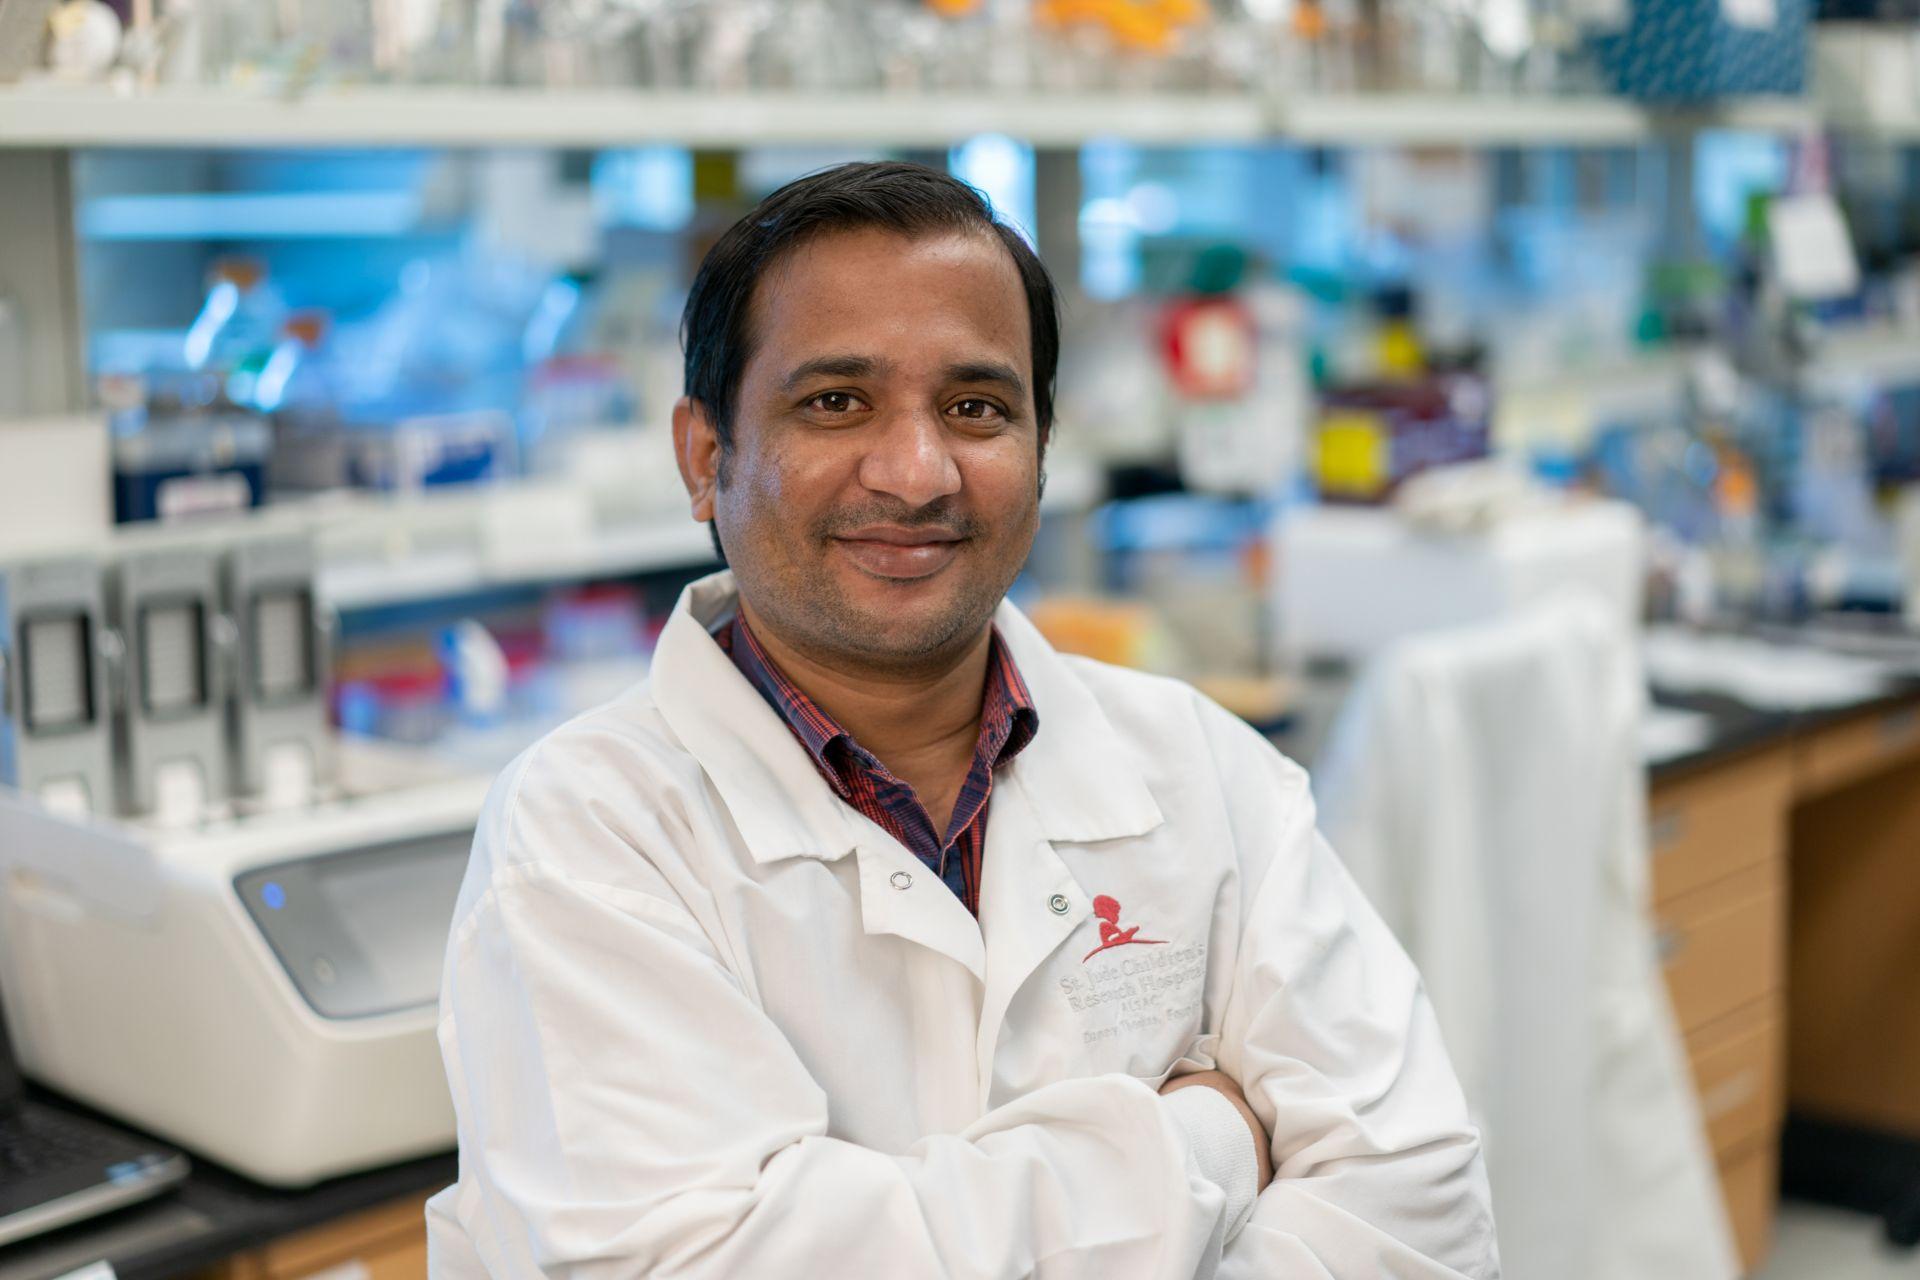 Balabhaskararao Kancharana, PhD